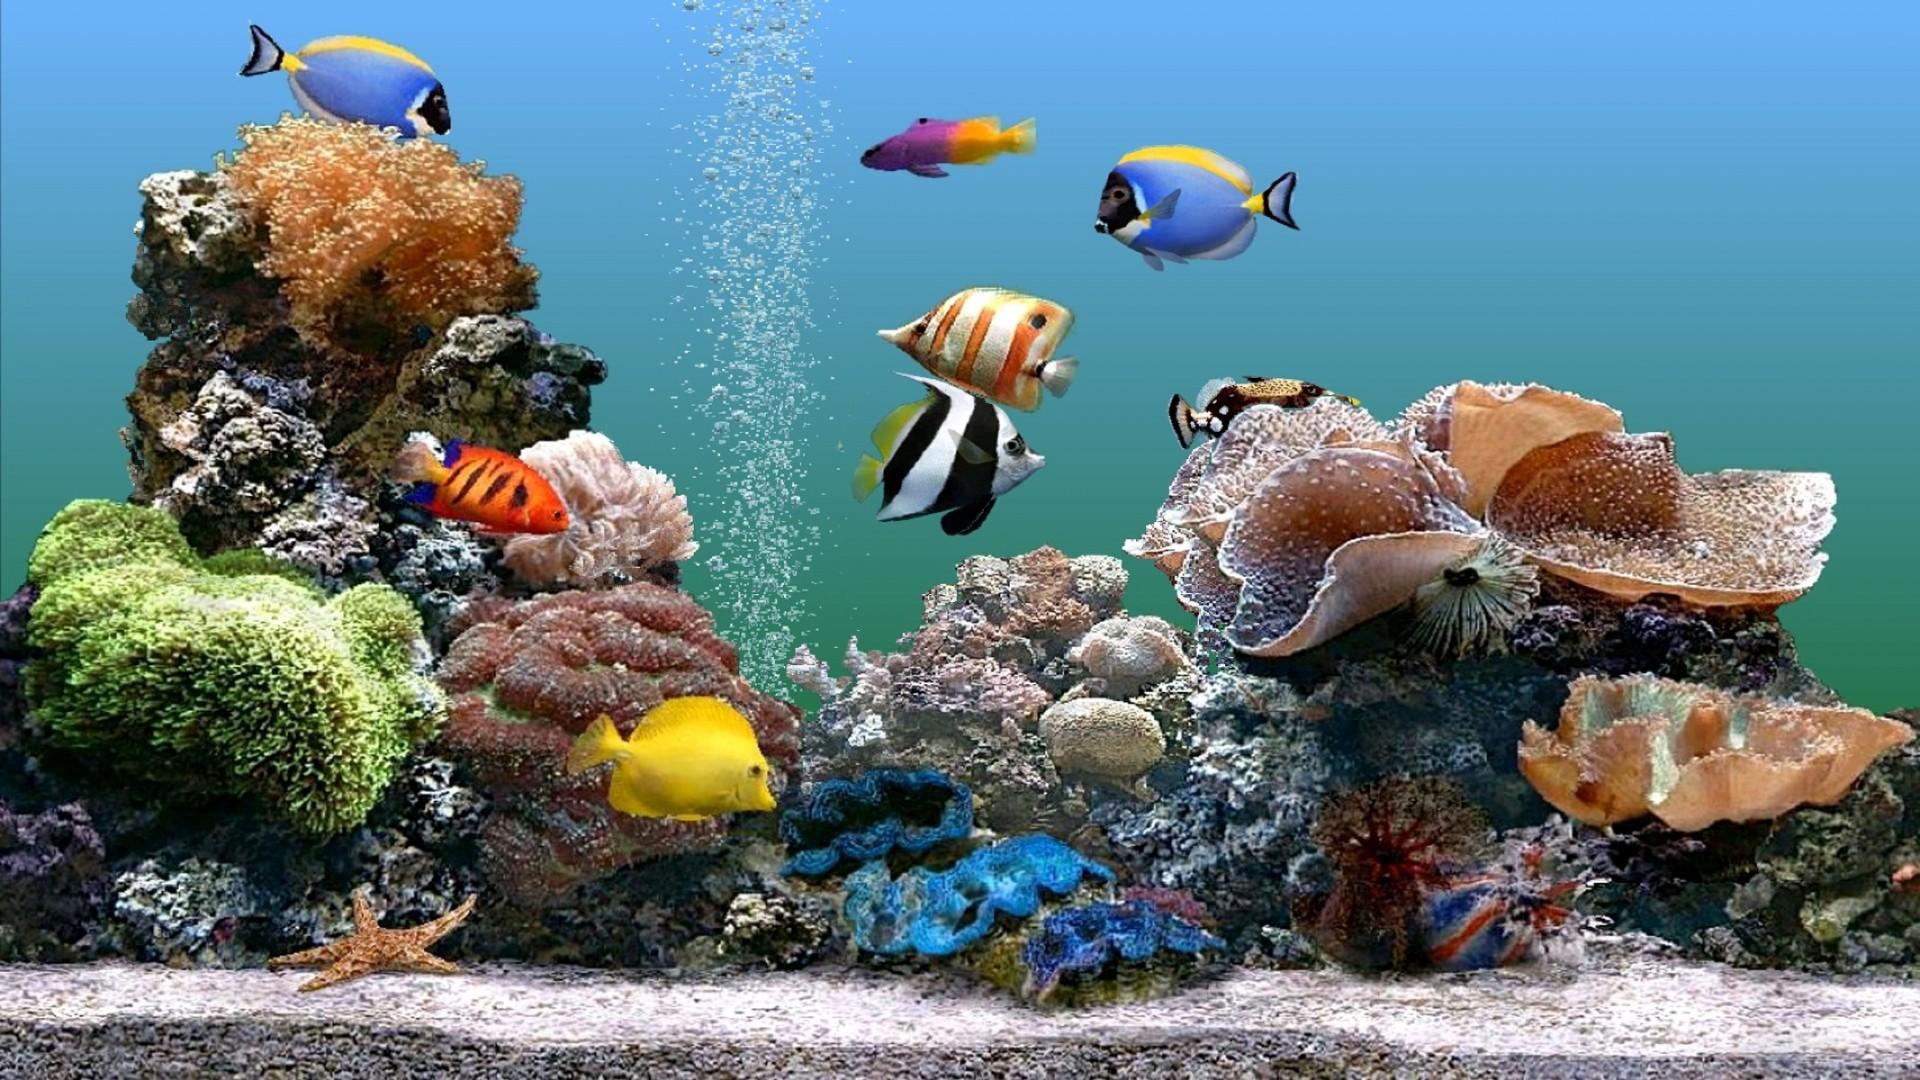 Картинки на рабочий стол аквариум с рыбками  Wallpapers